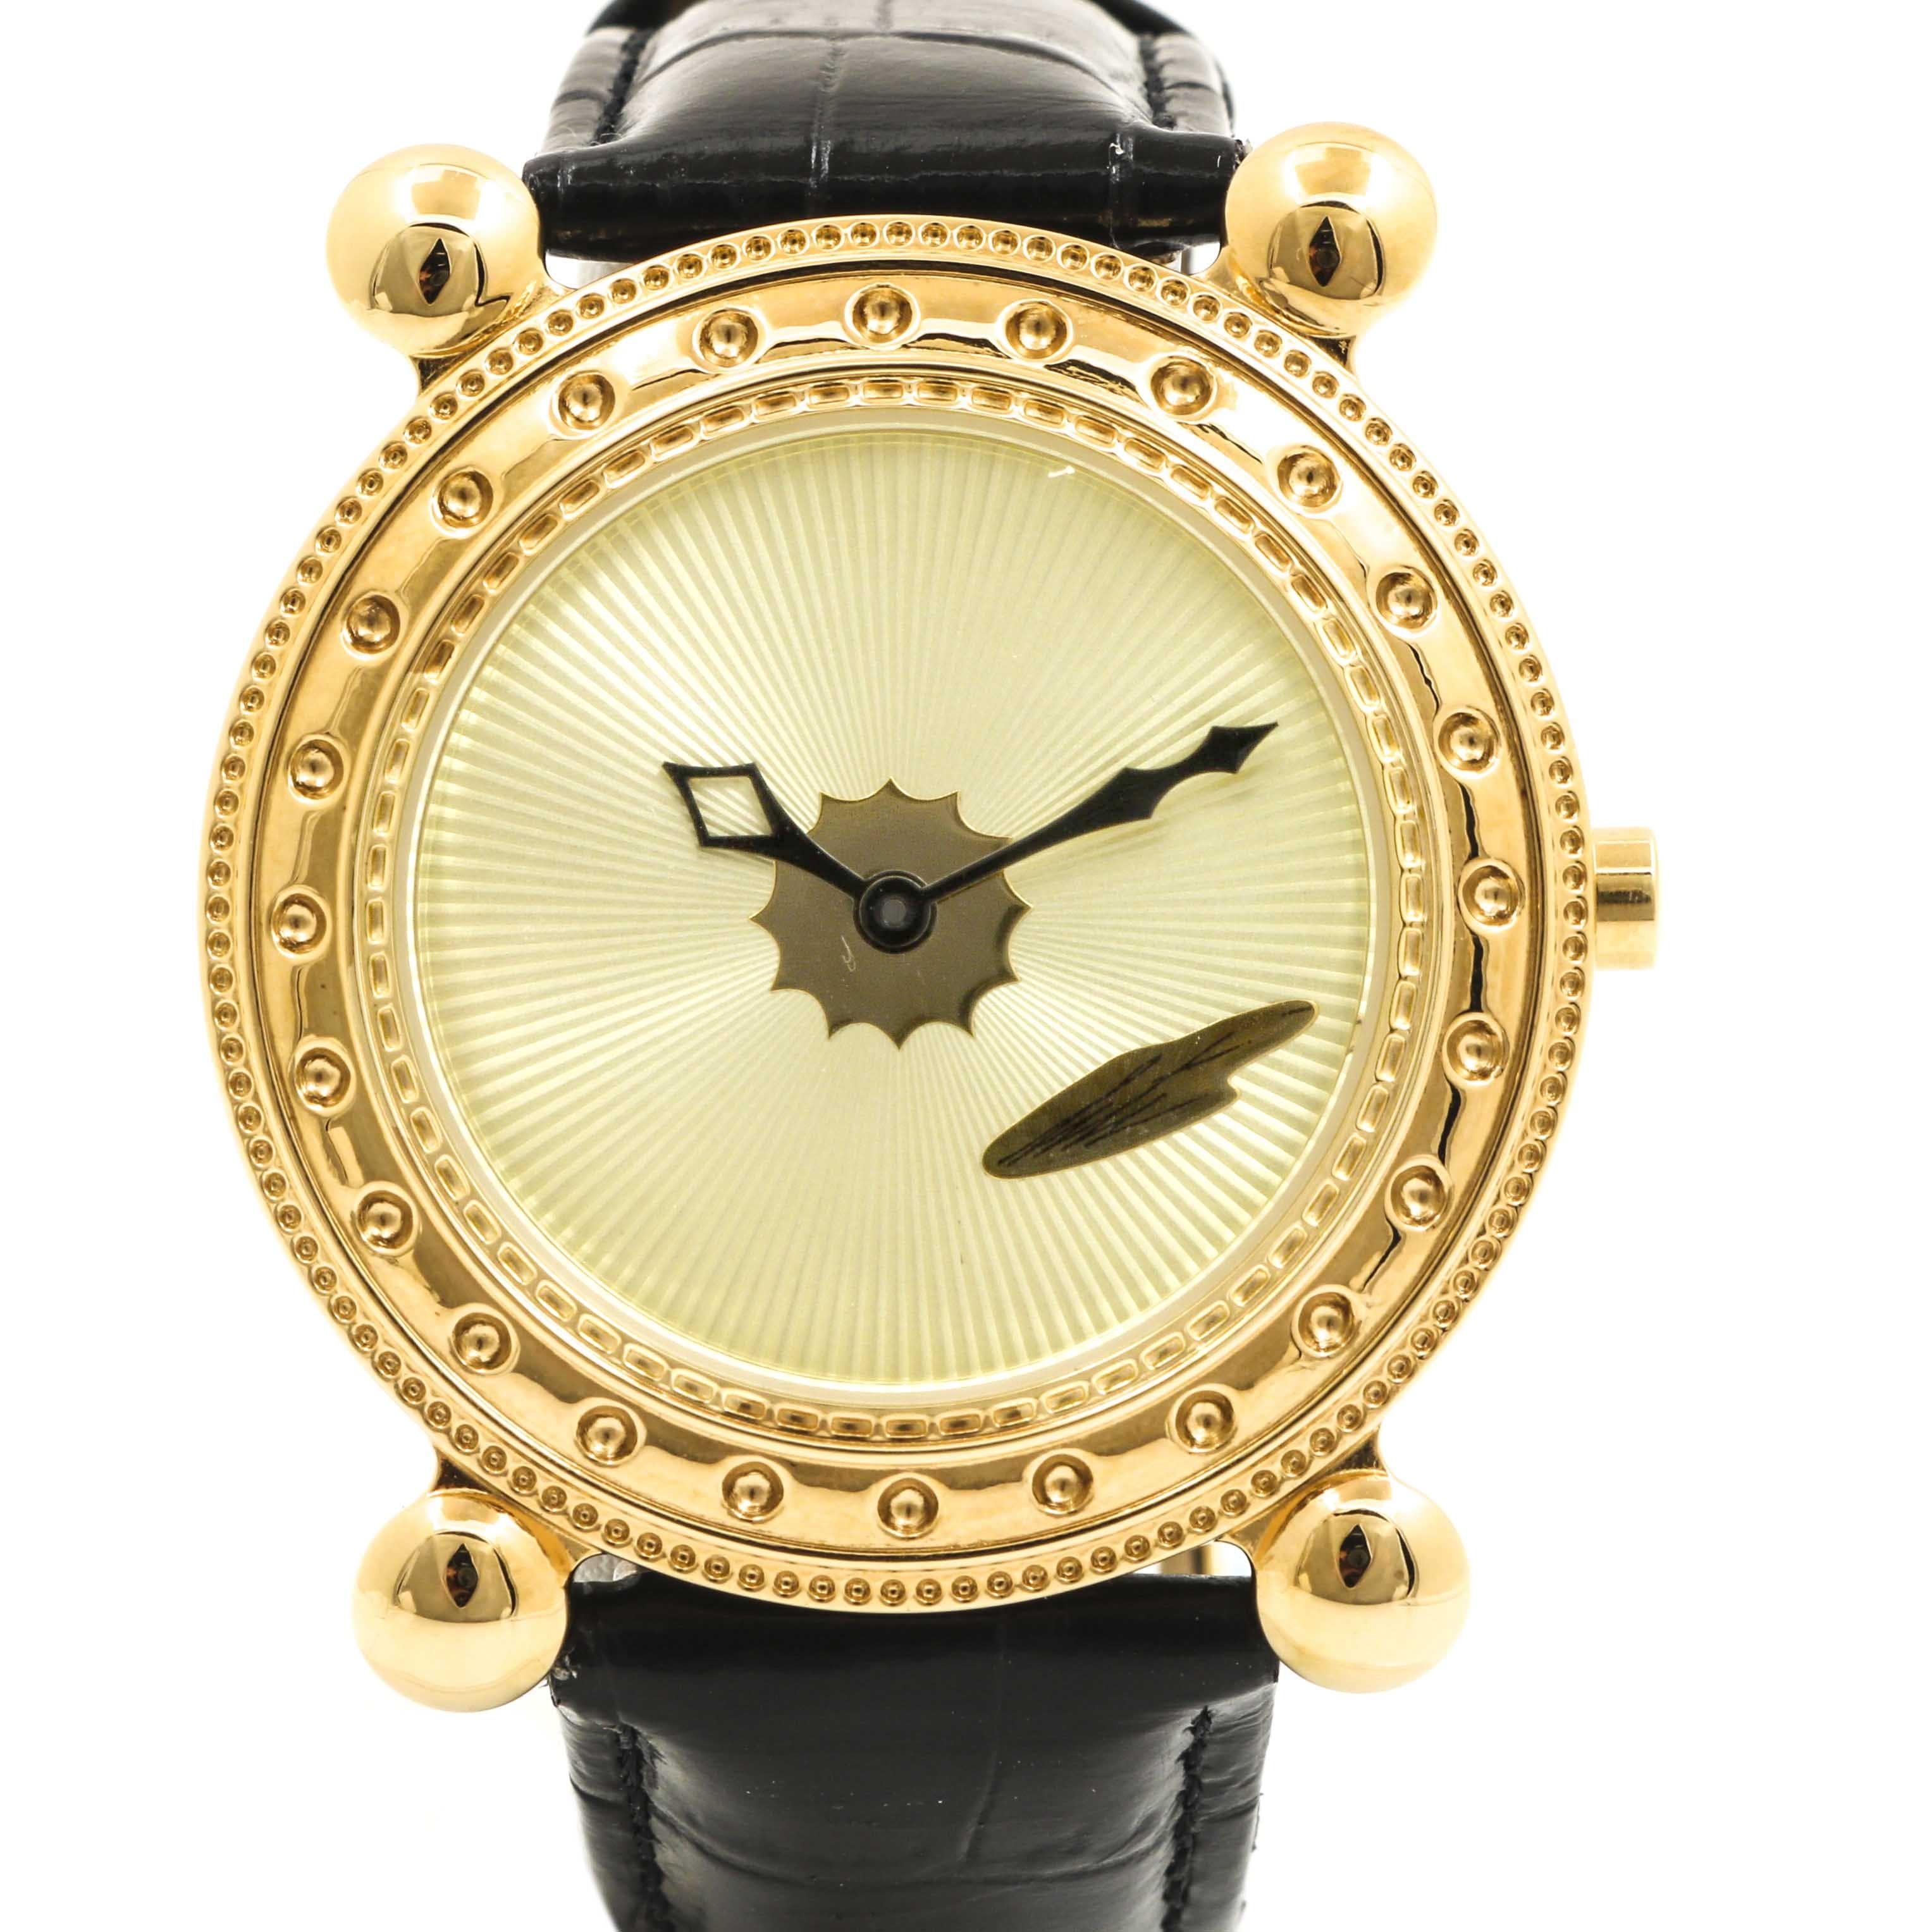 Erté Yellow Gold Plate Stainless Steel Wristwatch